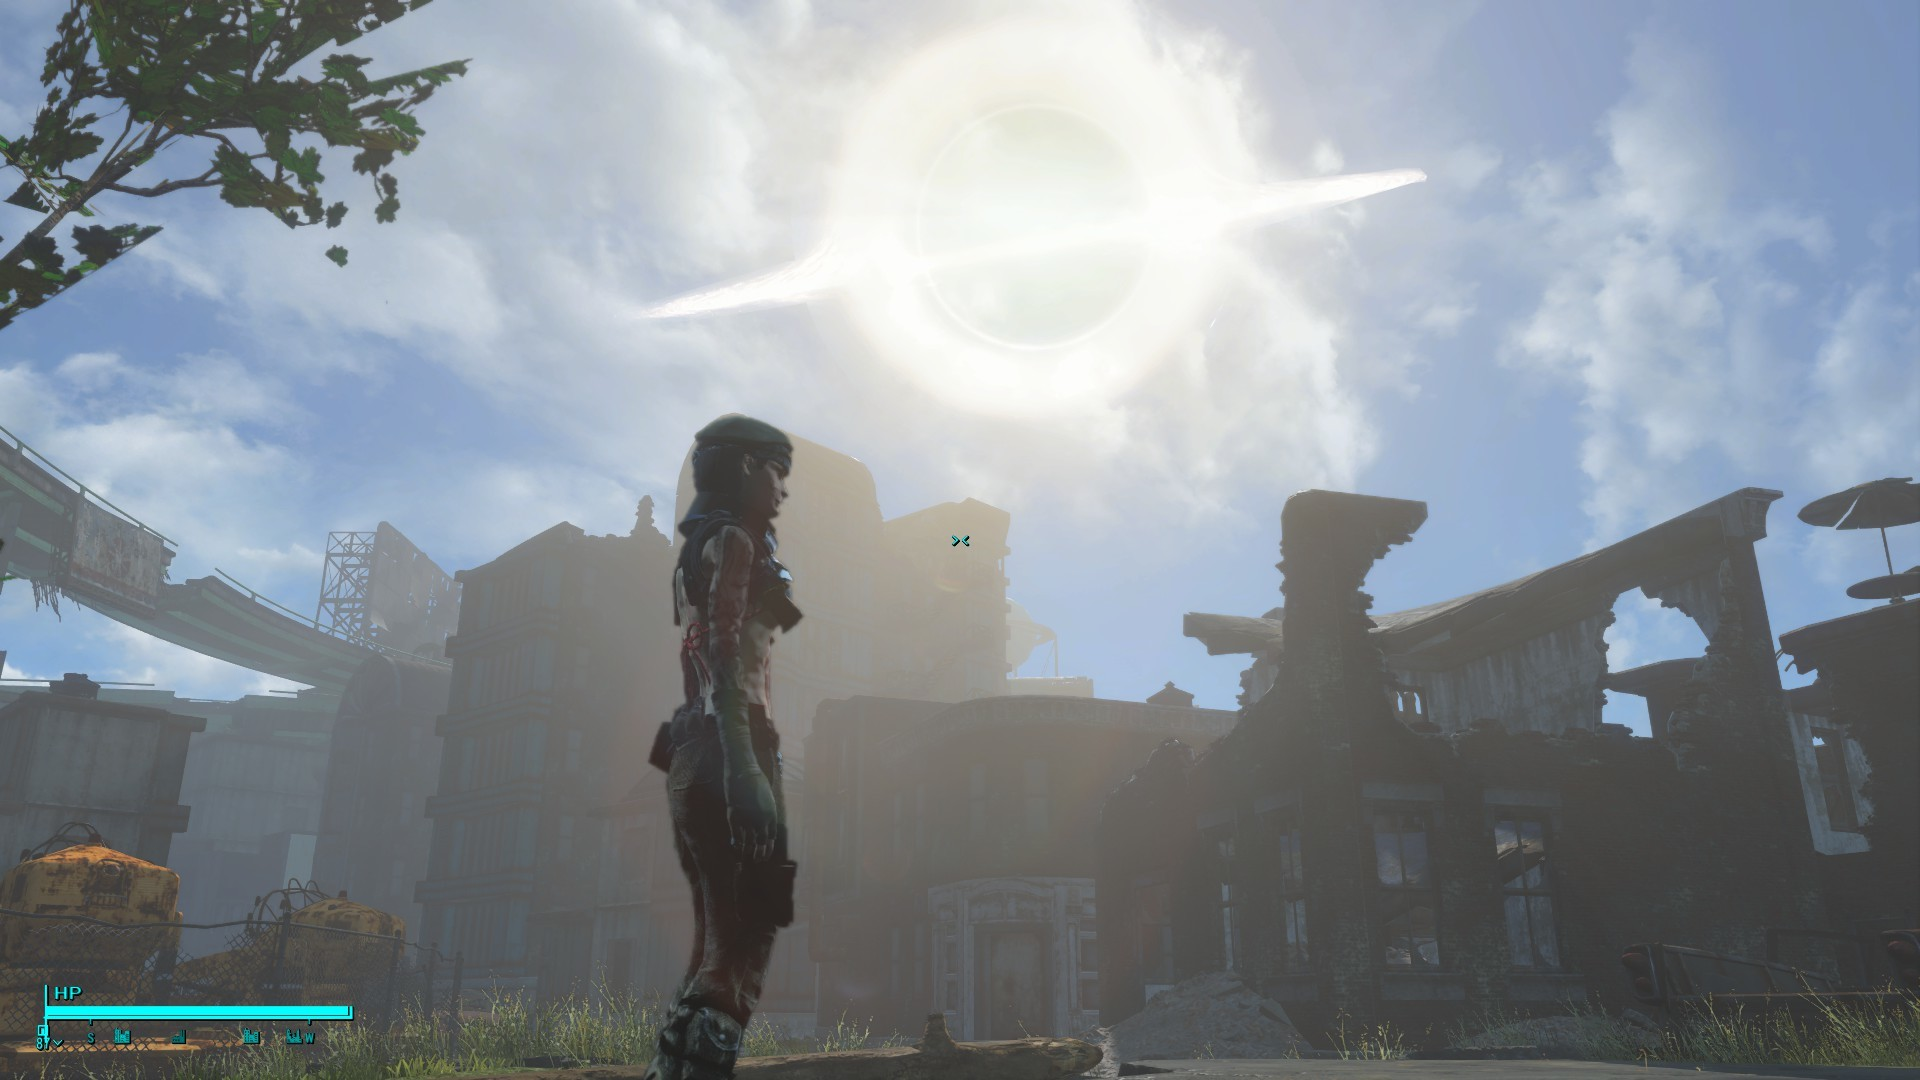 Gargantua from Interstellar for the sun at Fallout 4 Nexus – Mods and  community